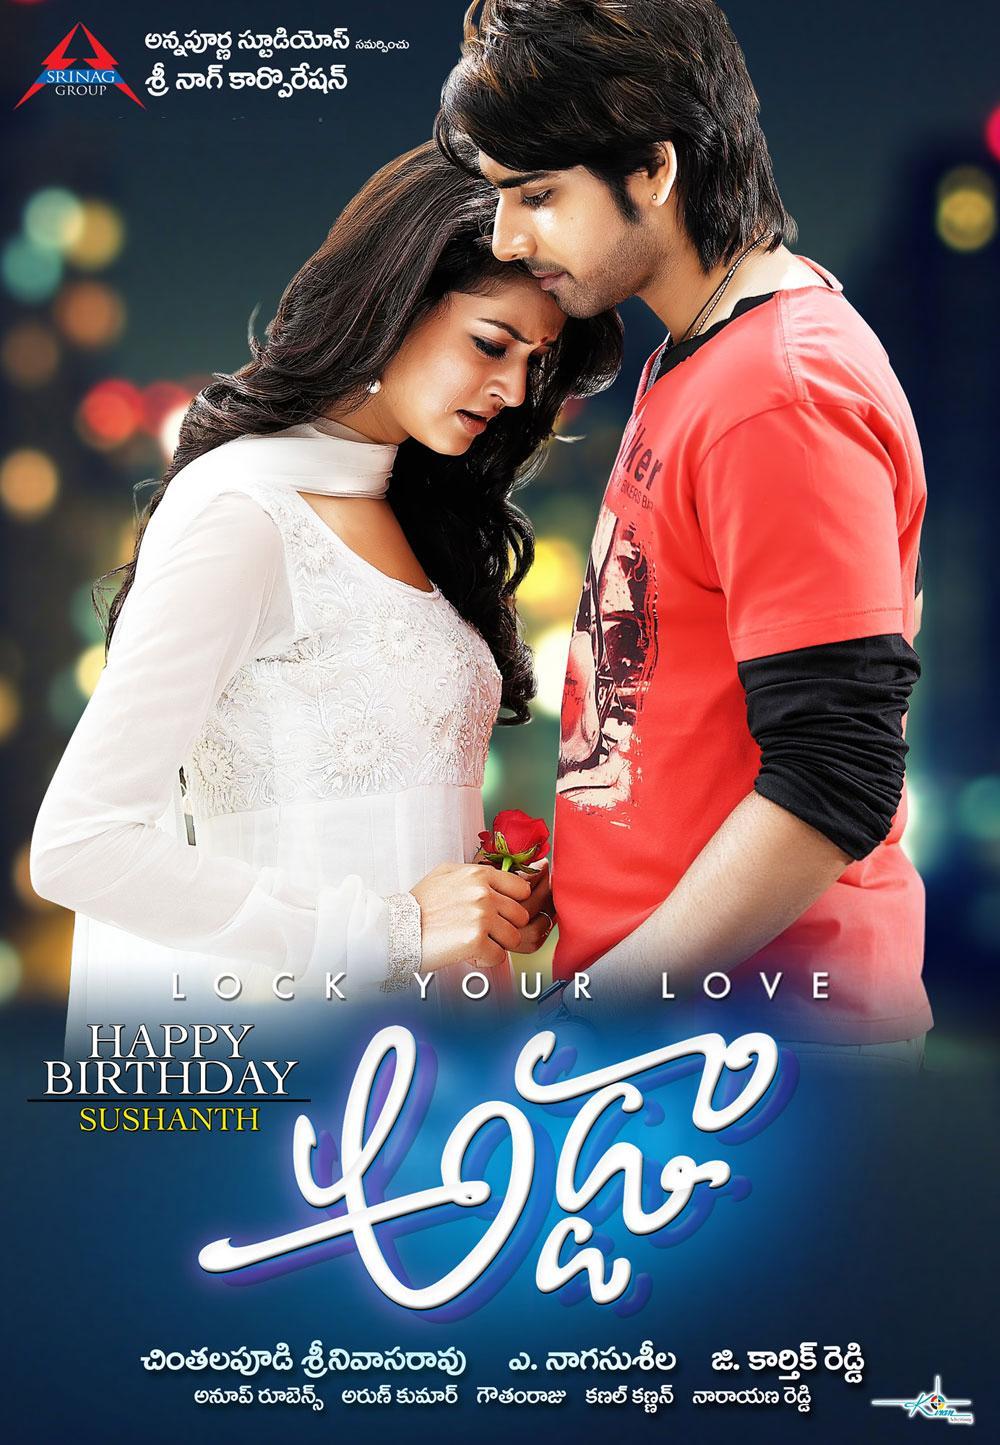 Telugu movies torrent download